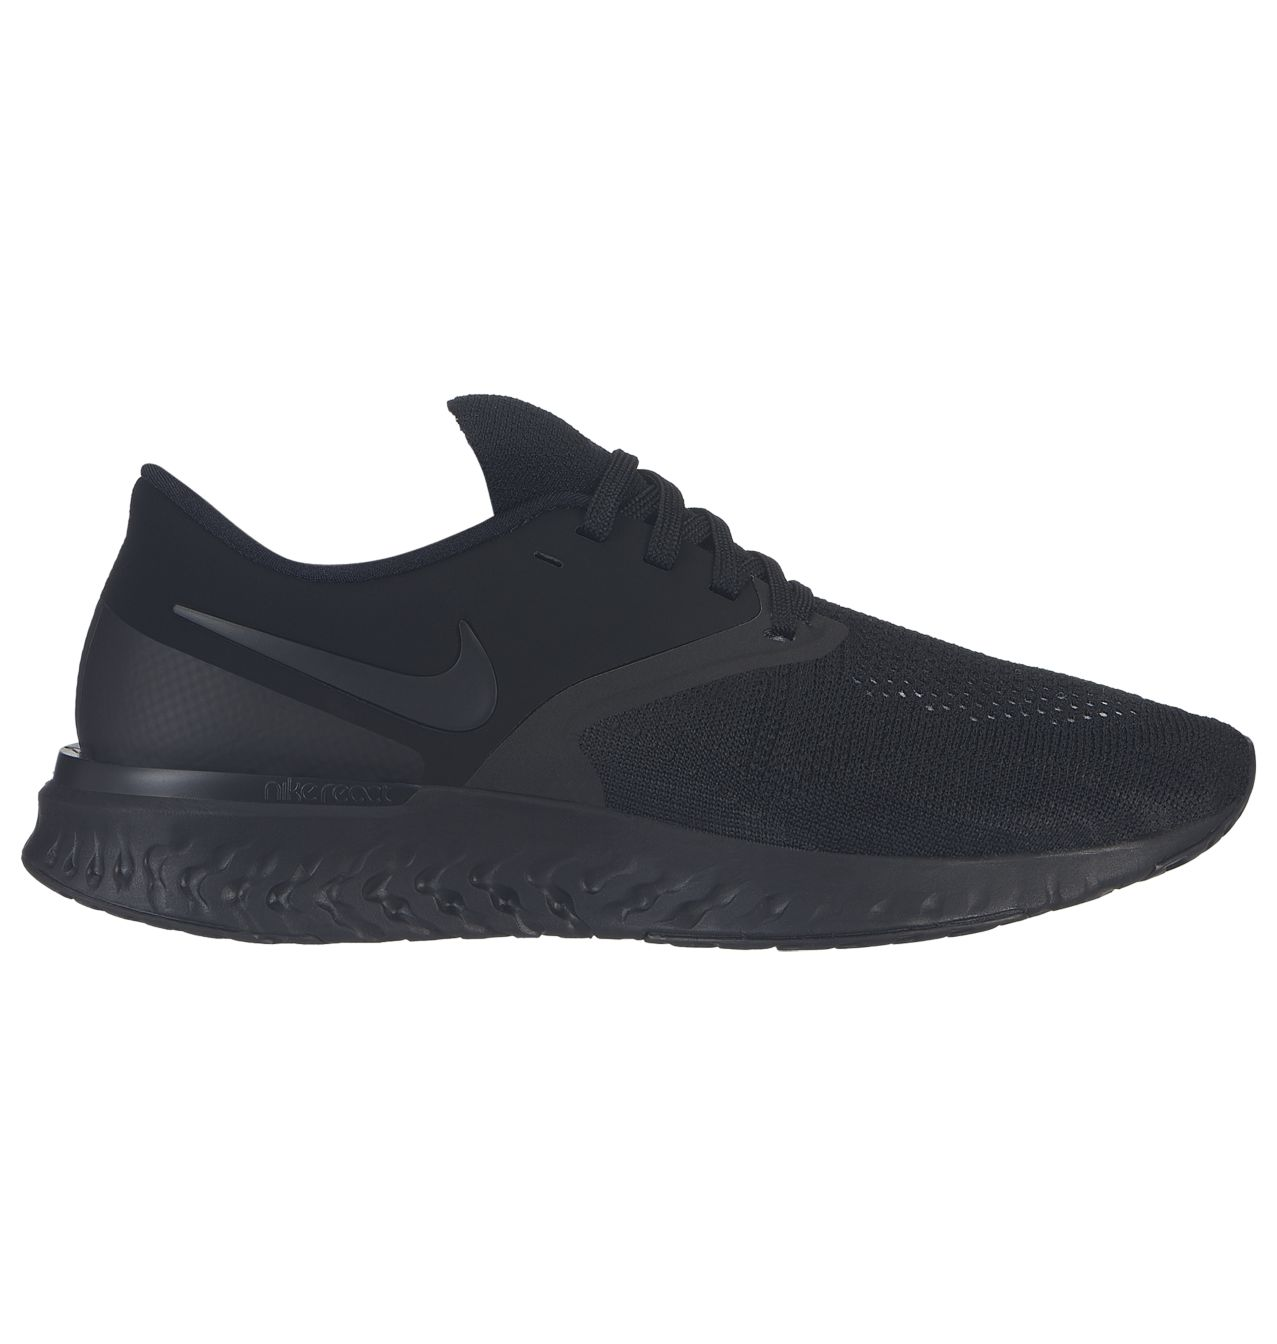 Next Nike Odyssey React - WearTesters